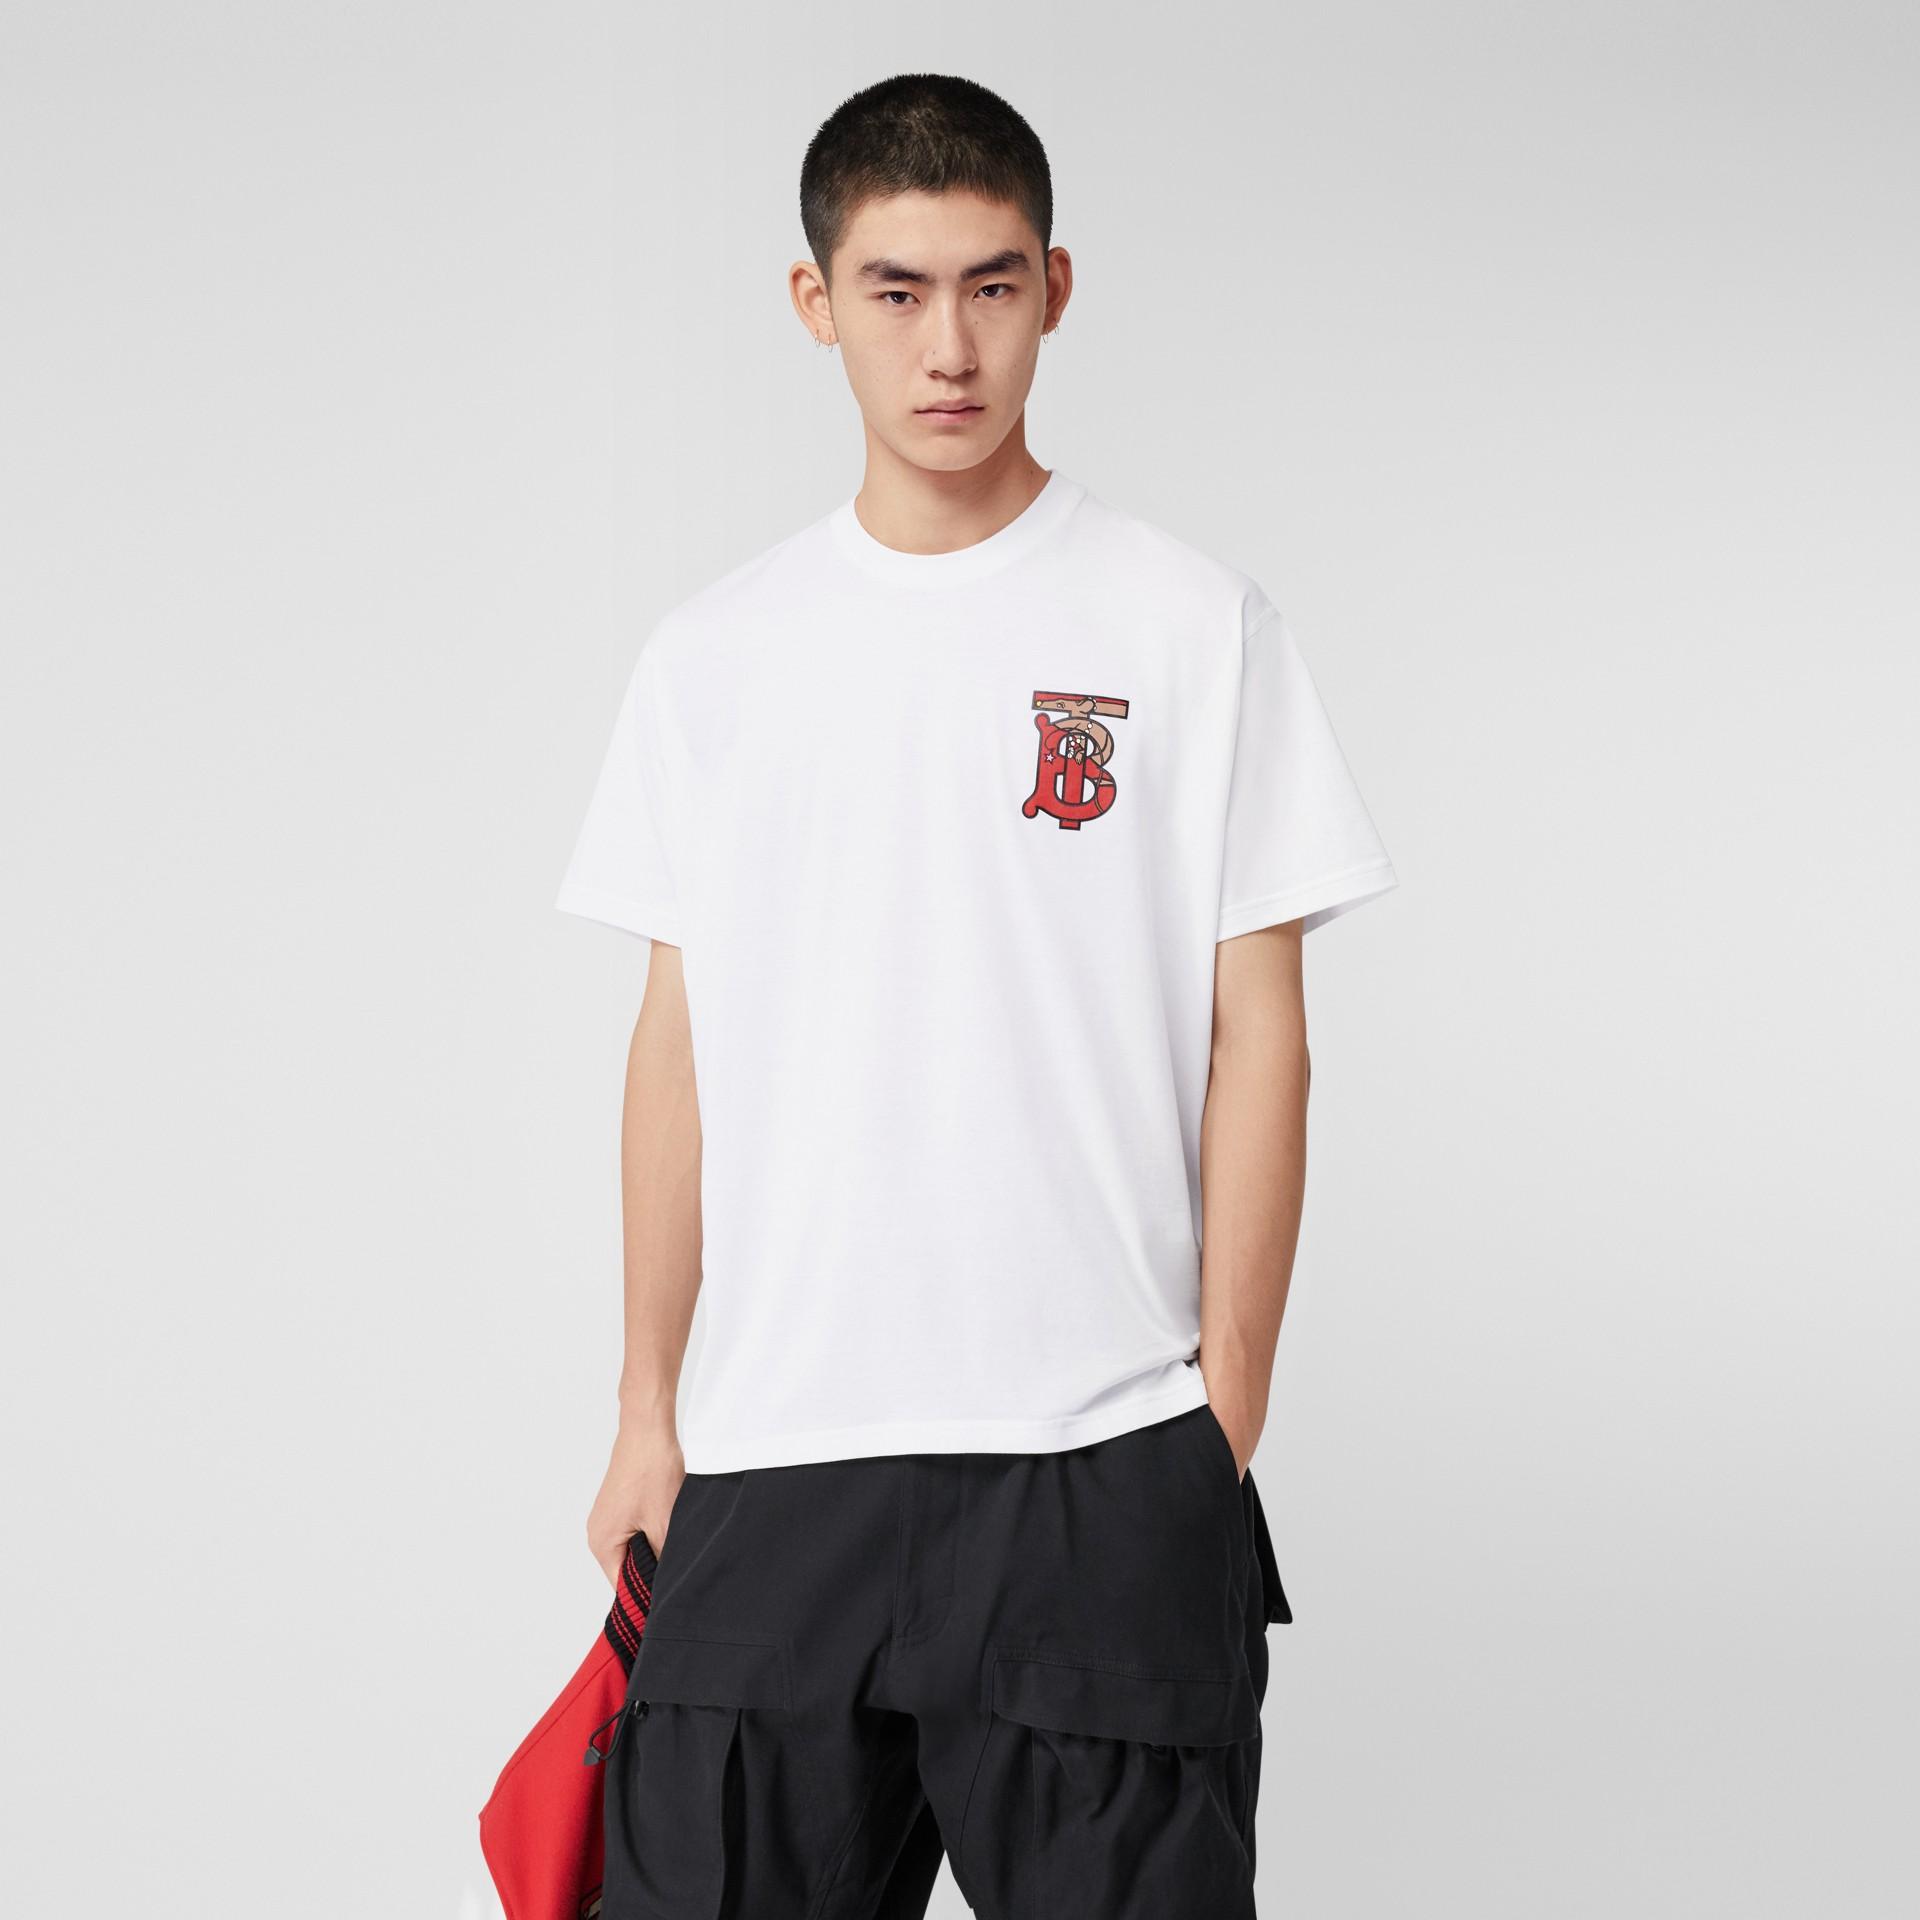 Monogram Motif Cotton Oversized T-shirt in White - Men | Burberry - gallery image 4